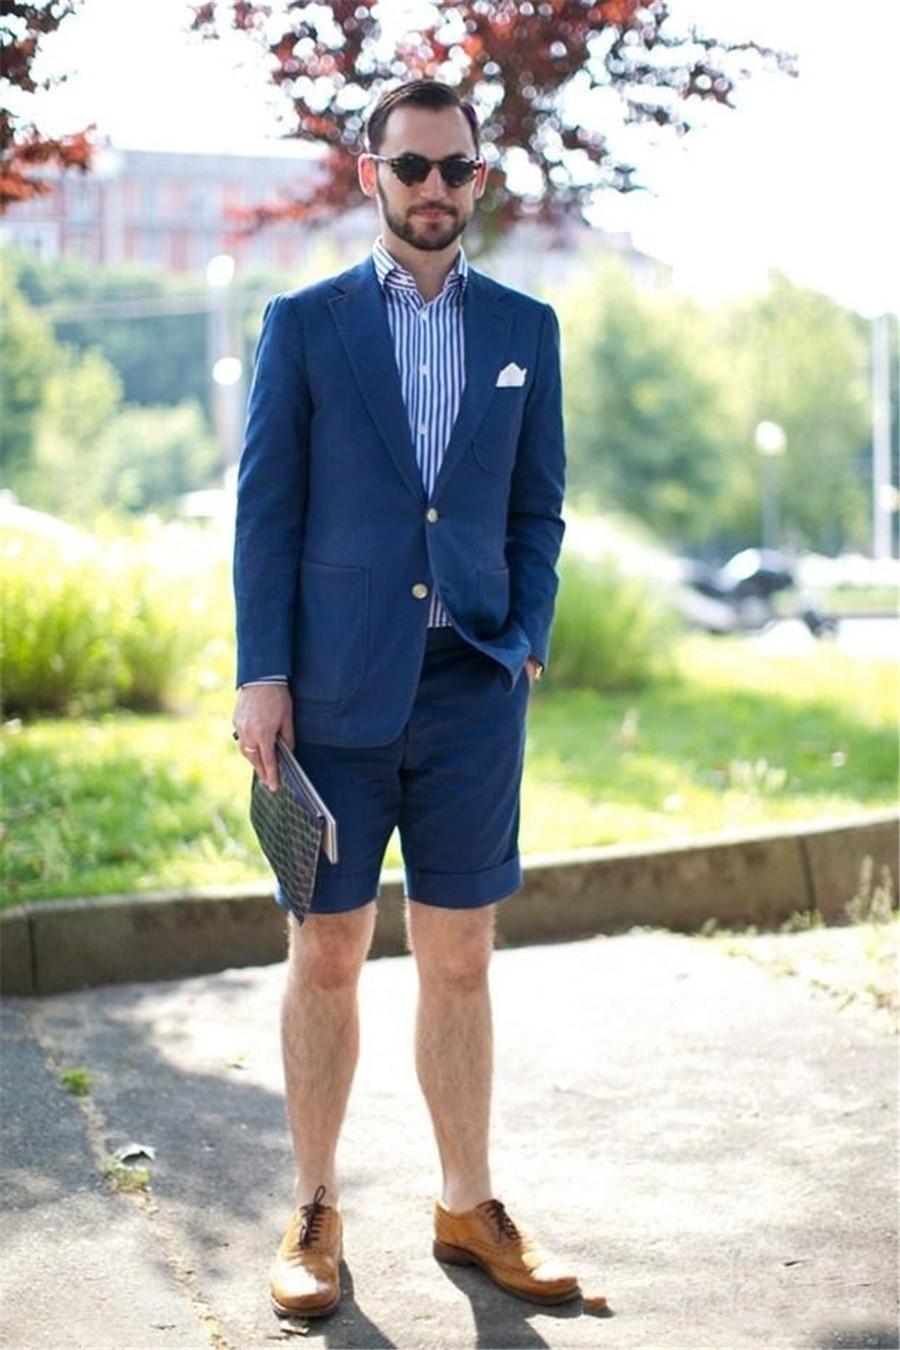 Blue Slim Fit Suit Separates For Men Custom Made Men's Causal Tailcoat Simple Modern Wedding Tuxedos (Jacket+Shorts)